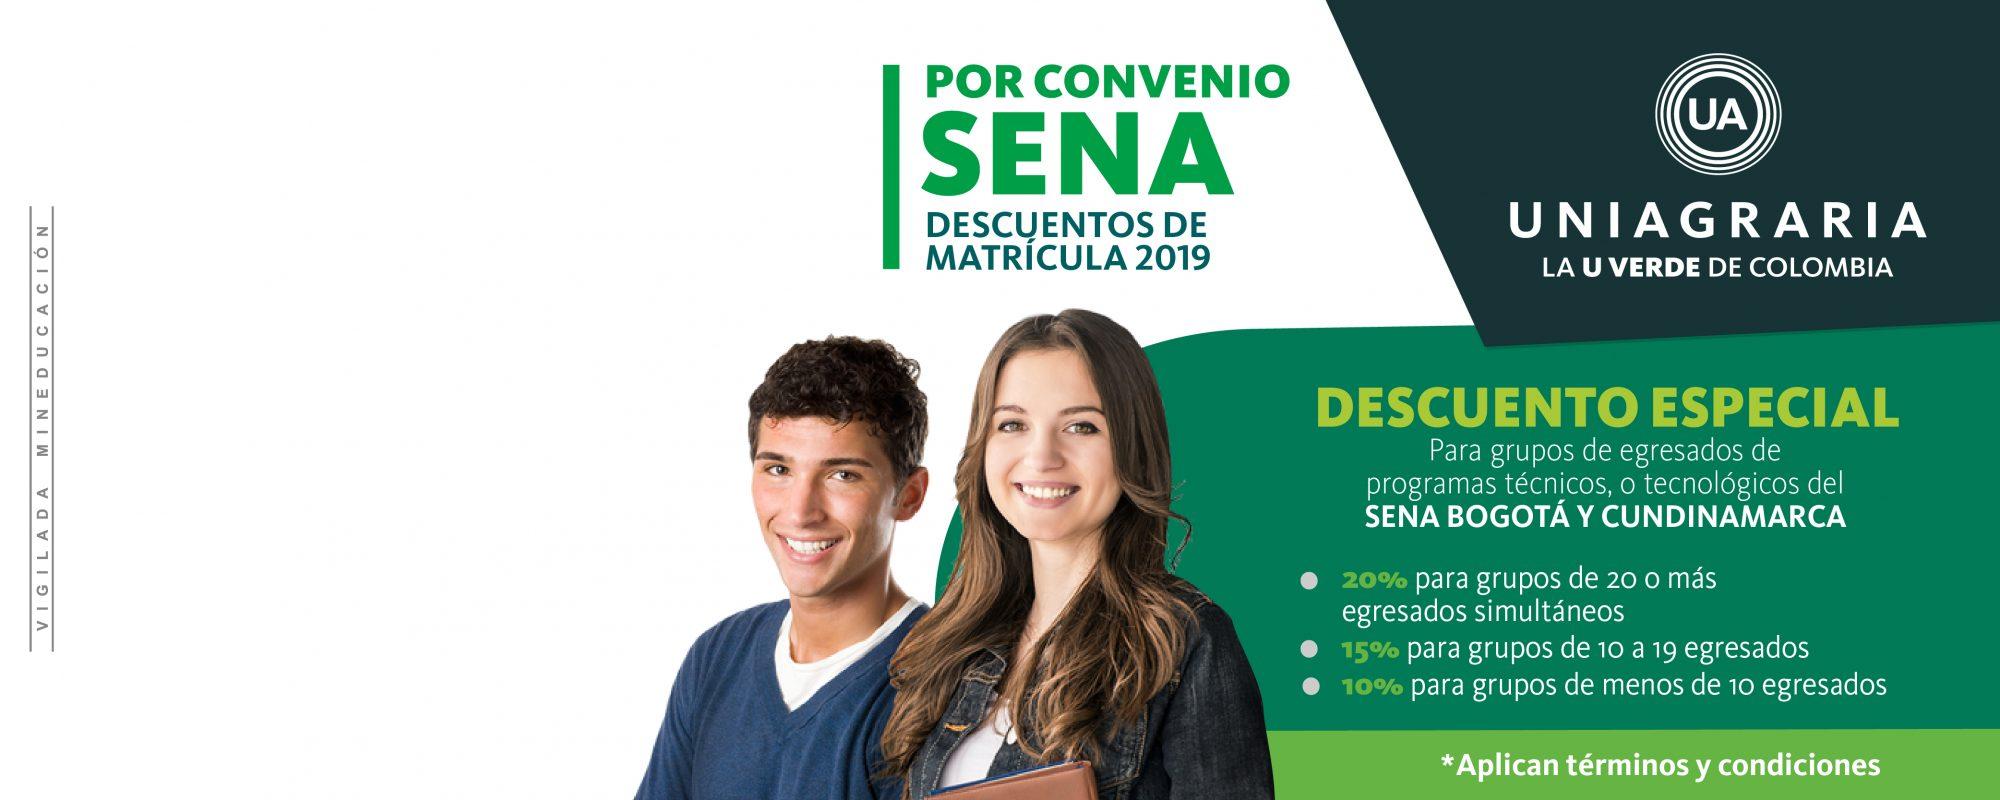 Descuentos de matrícula 2019 – Convenio SENA